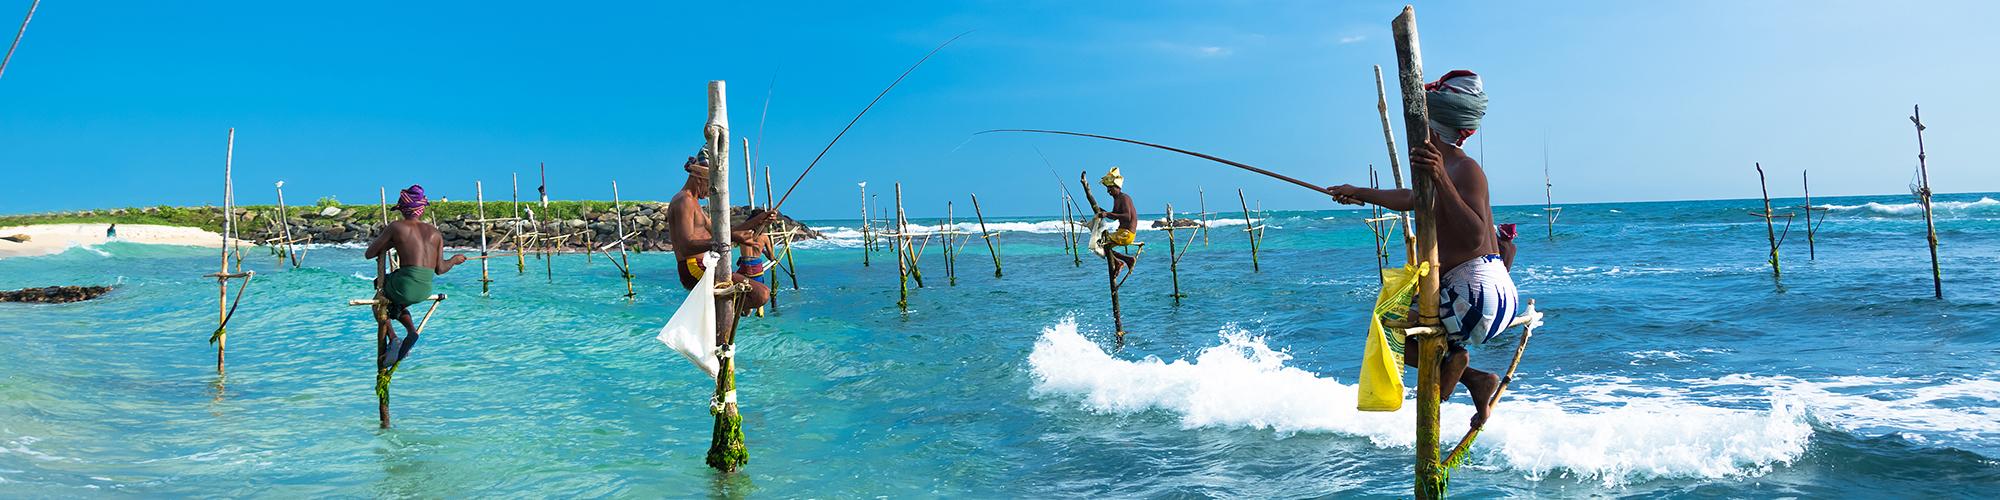 Stiltfishermen-Sri-Lanka